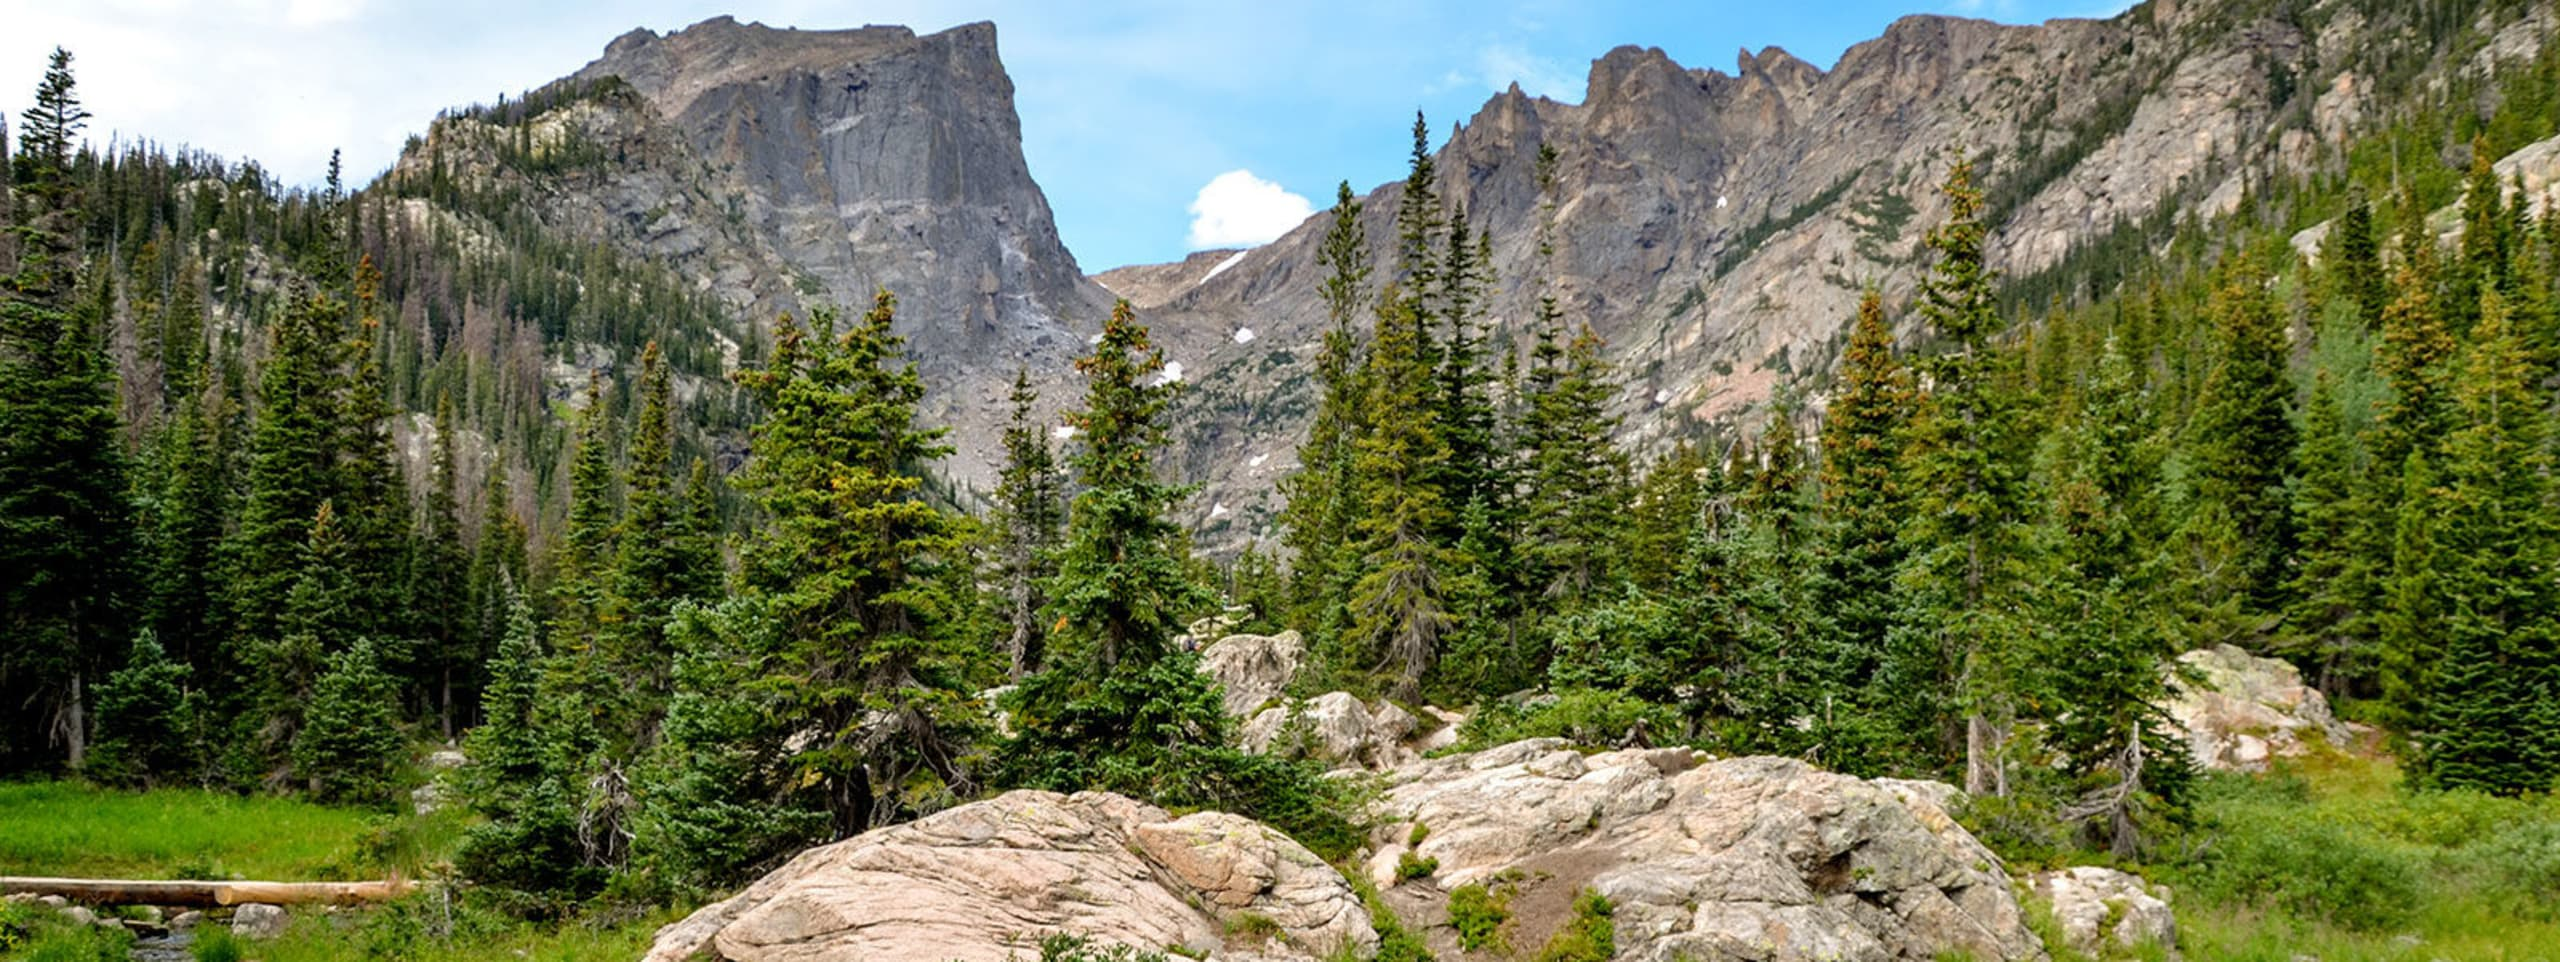 my colorado state parks rm-hallett-emeraldlaketrail_adobe_1600